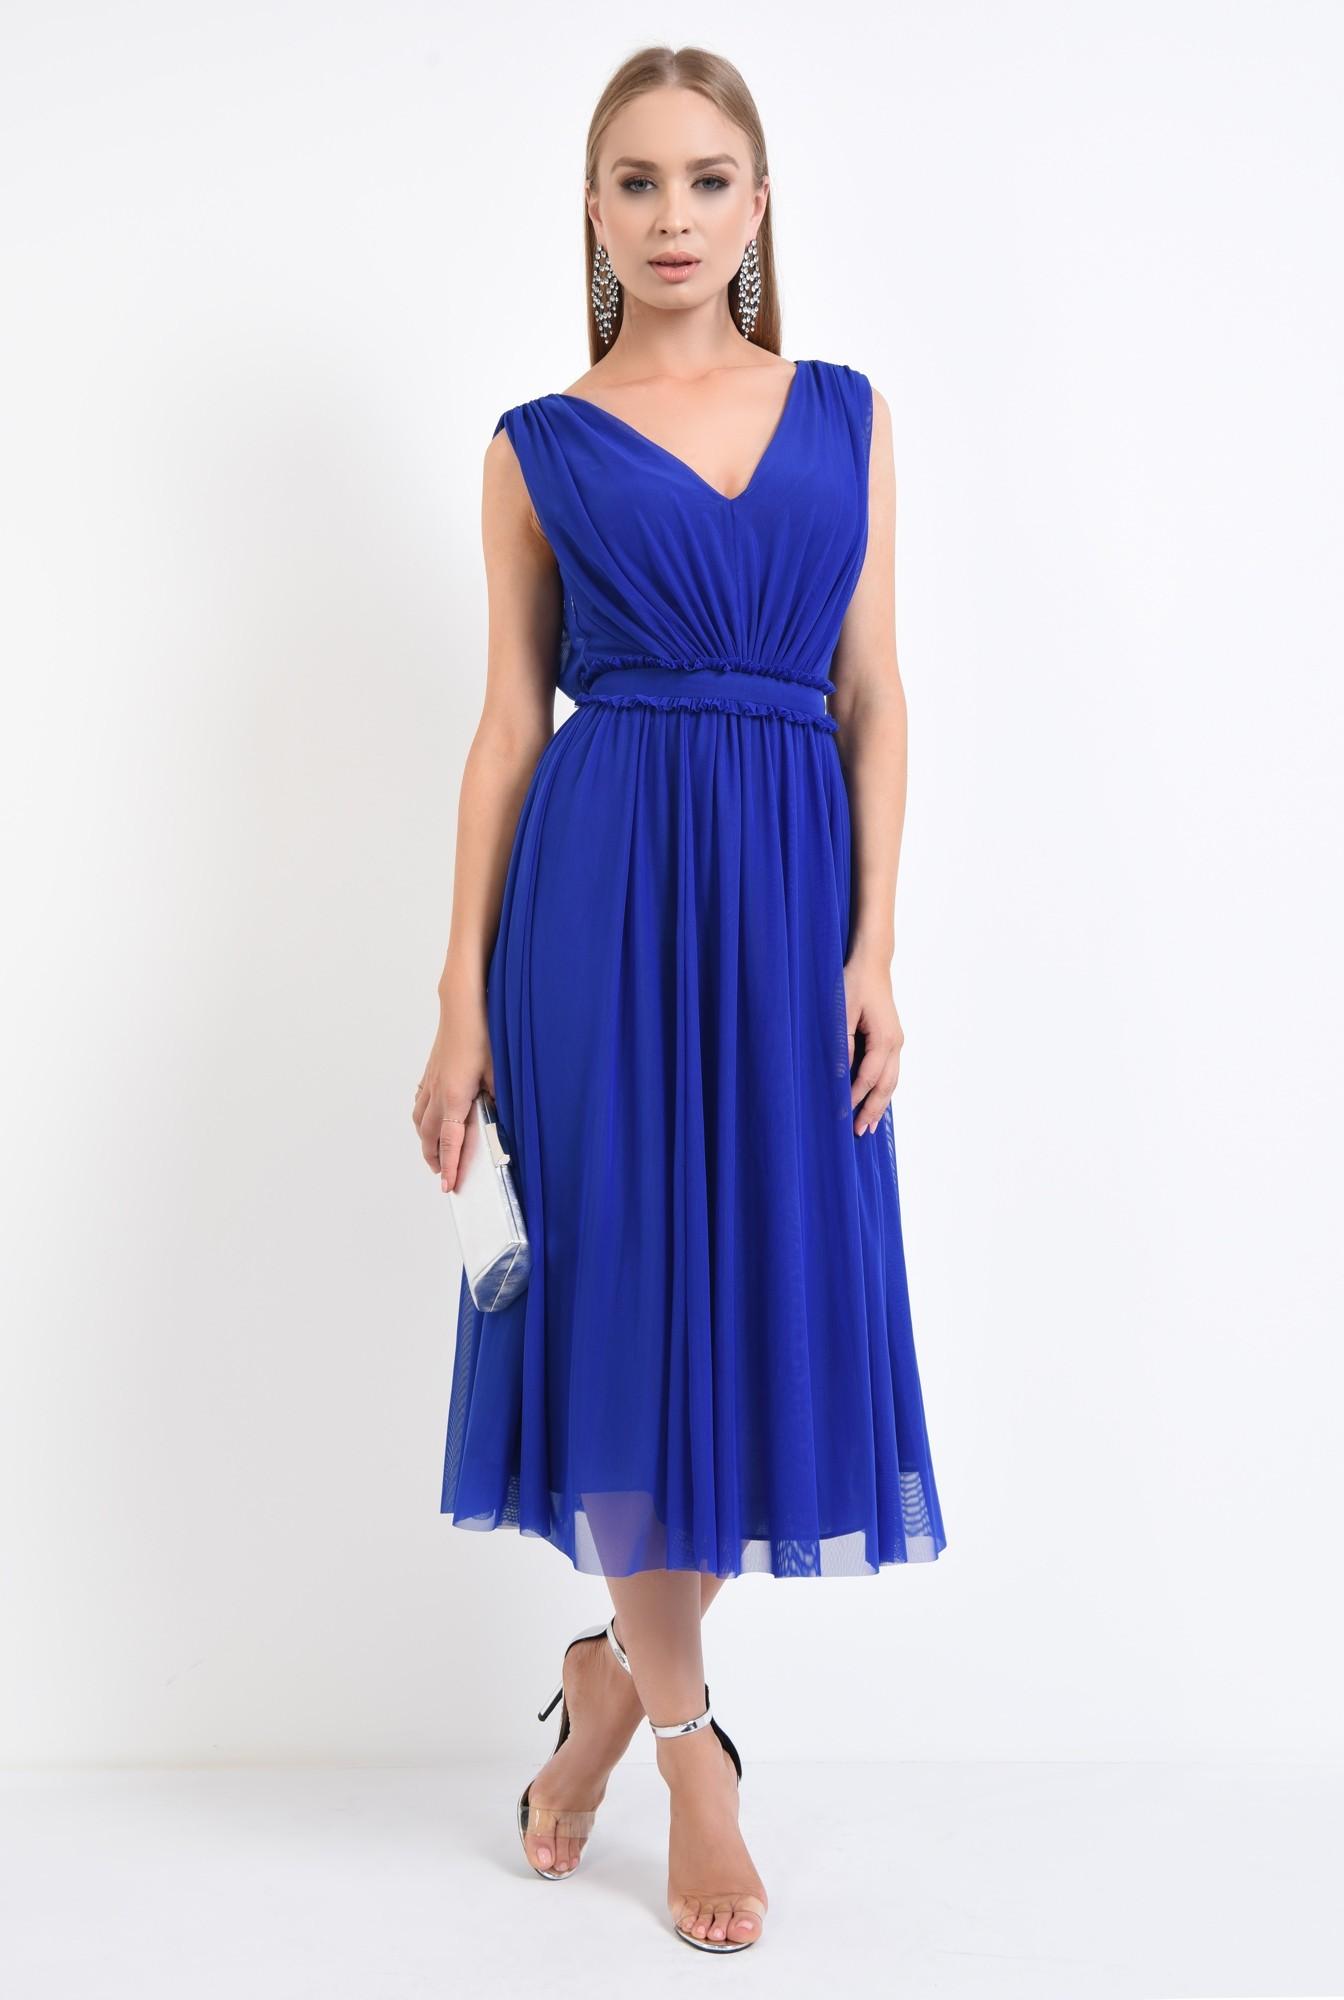 360 - rochie de seara, tul, albastru, clos, midi, rochii online